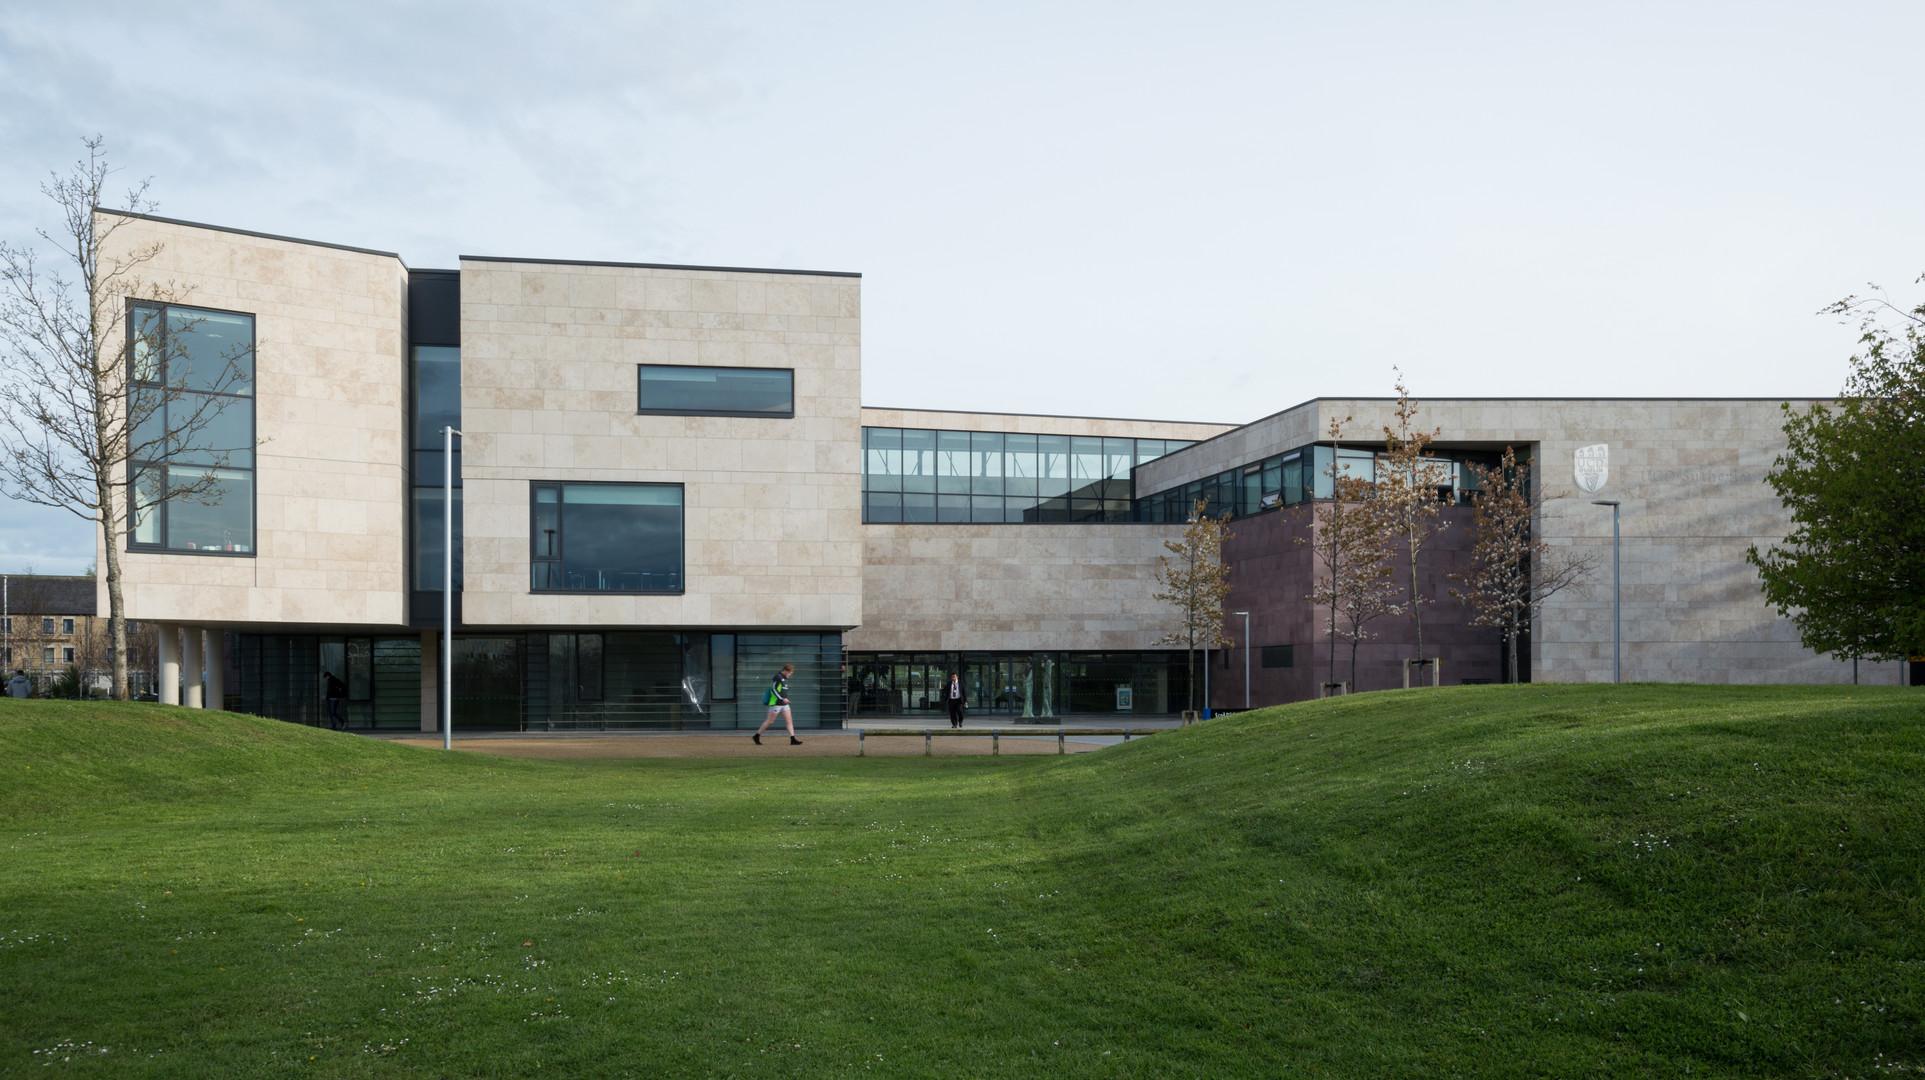 External view across the grass of Sutherland School of Law, UCD, Dublin